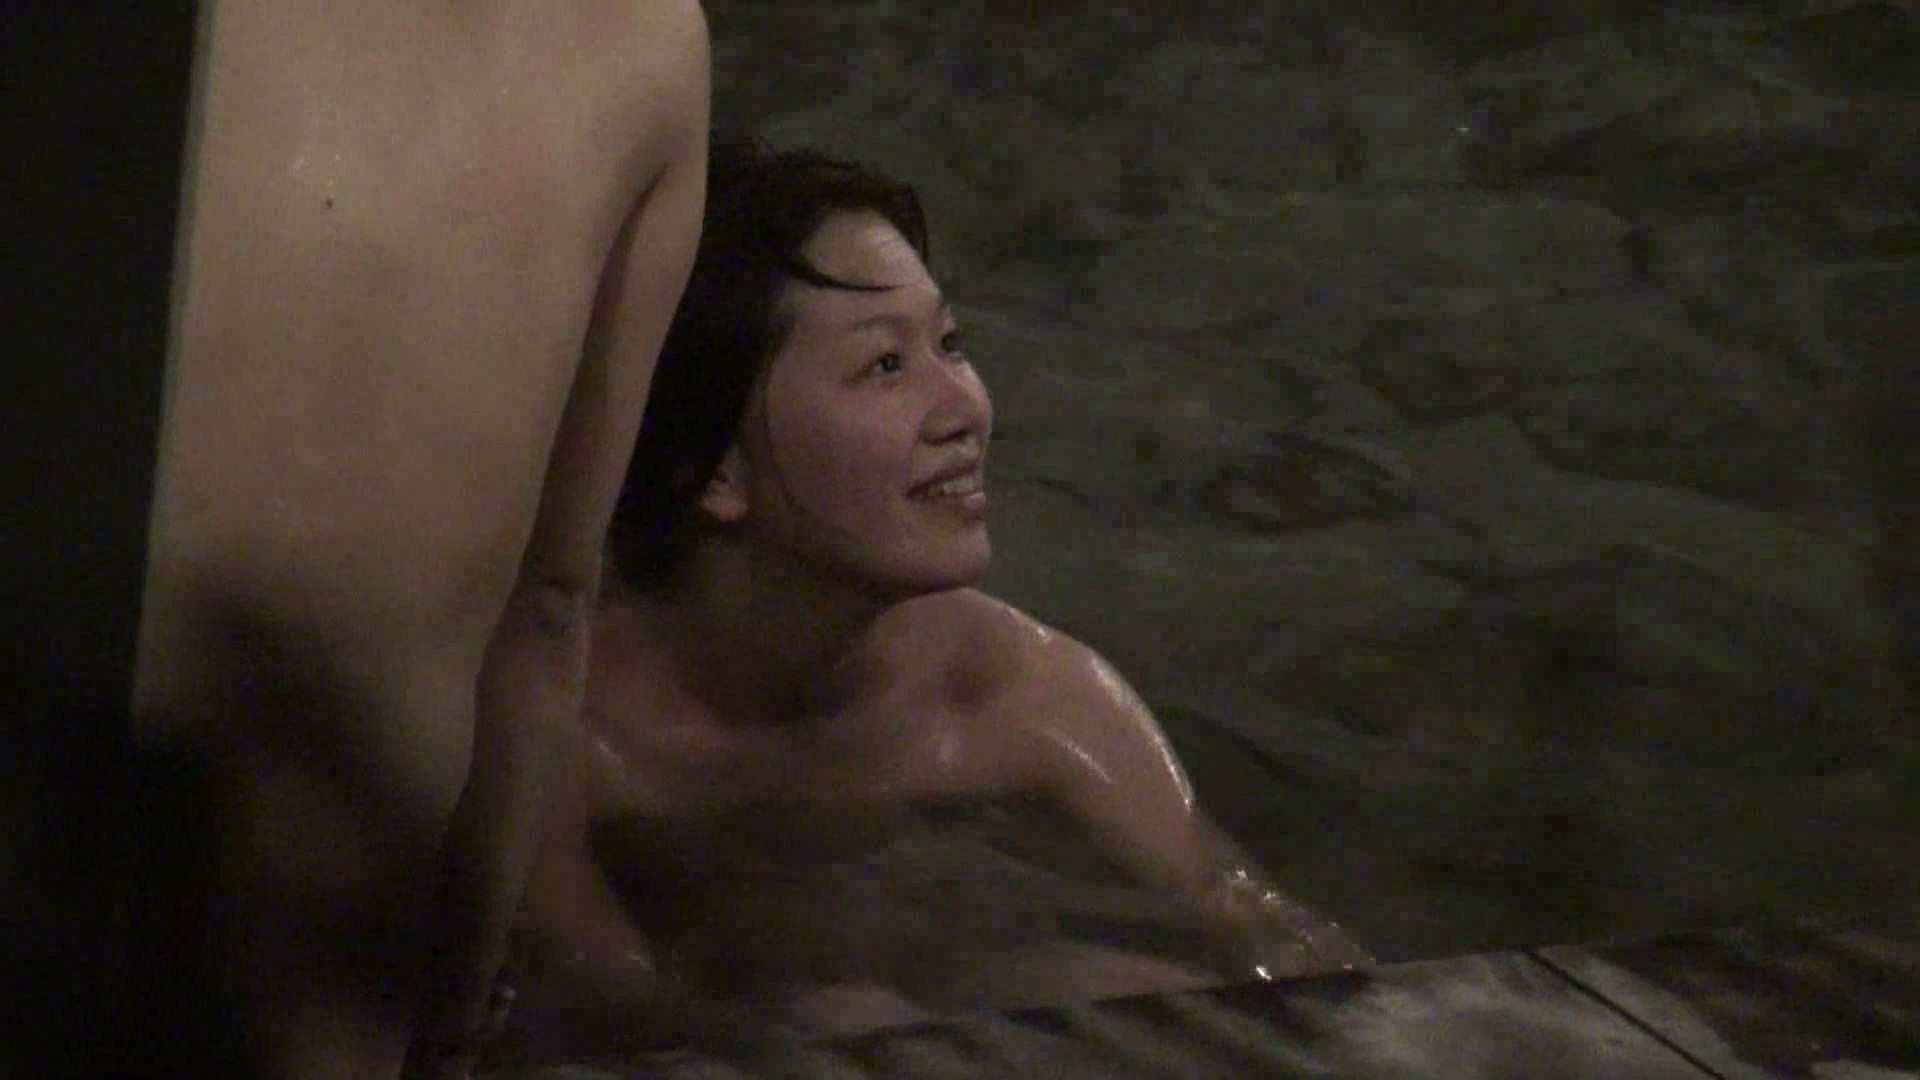 Aquaな露天風呂Vol.387 0  45連発 8